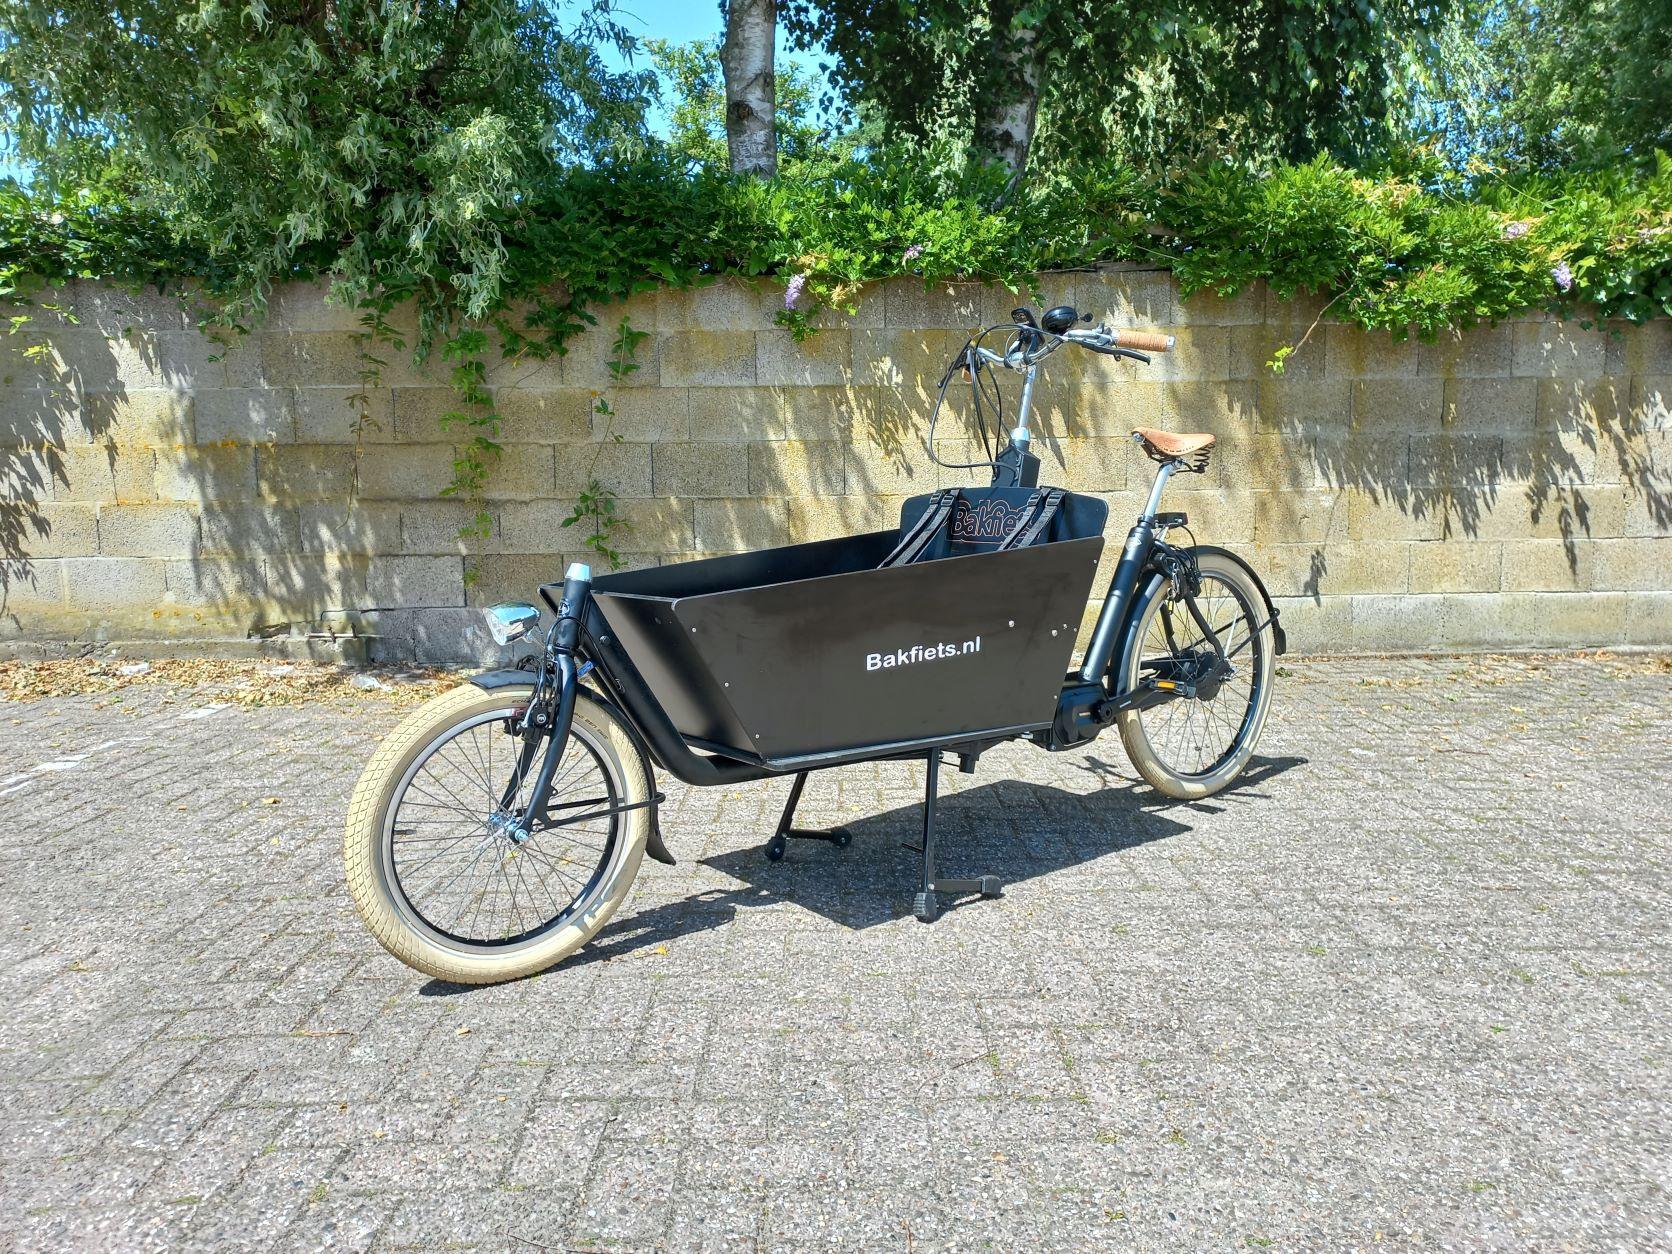 Elektrische bakfiets.nl CargoBike Cruiser Long Steps (voorraad model)